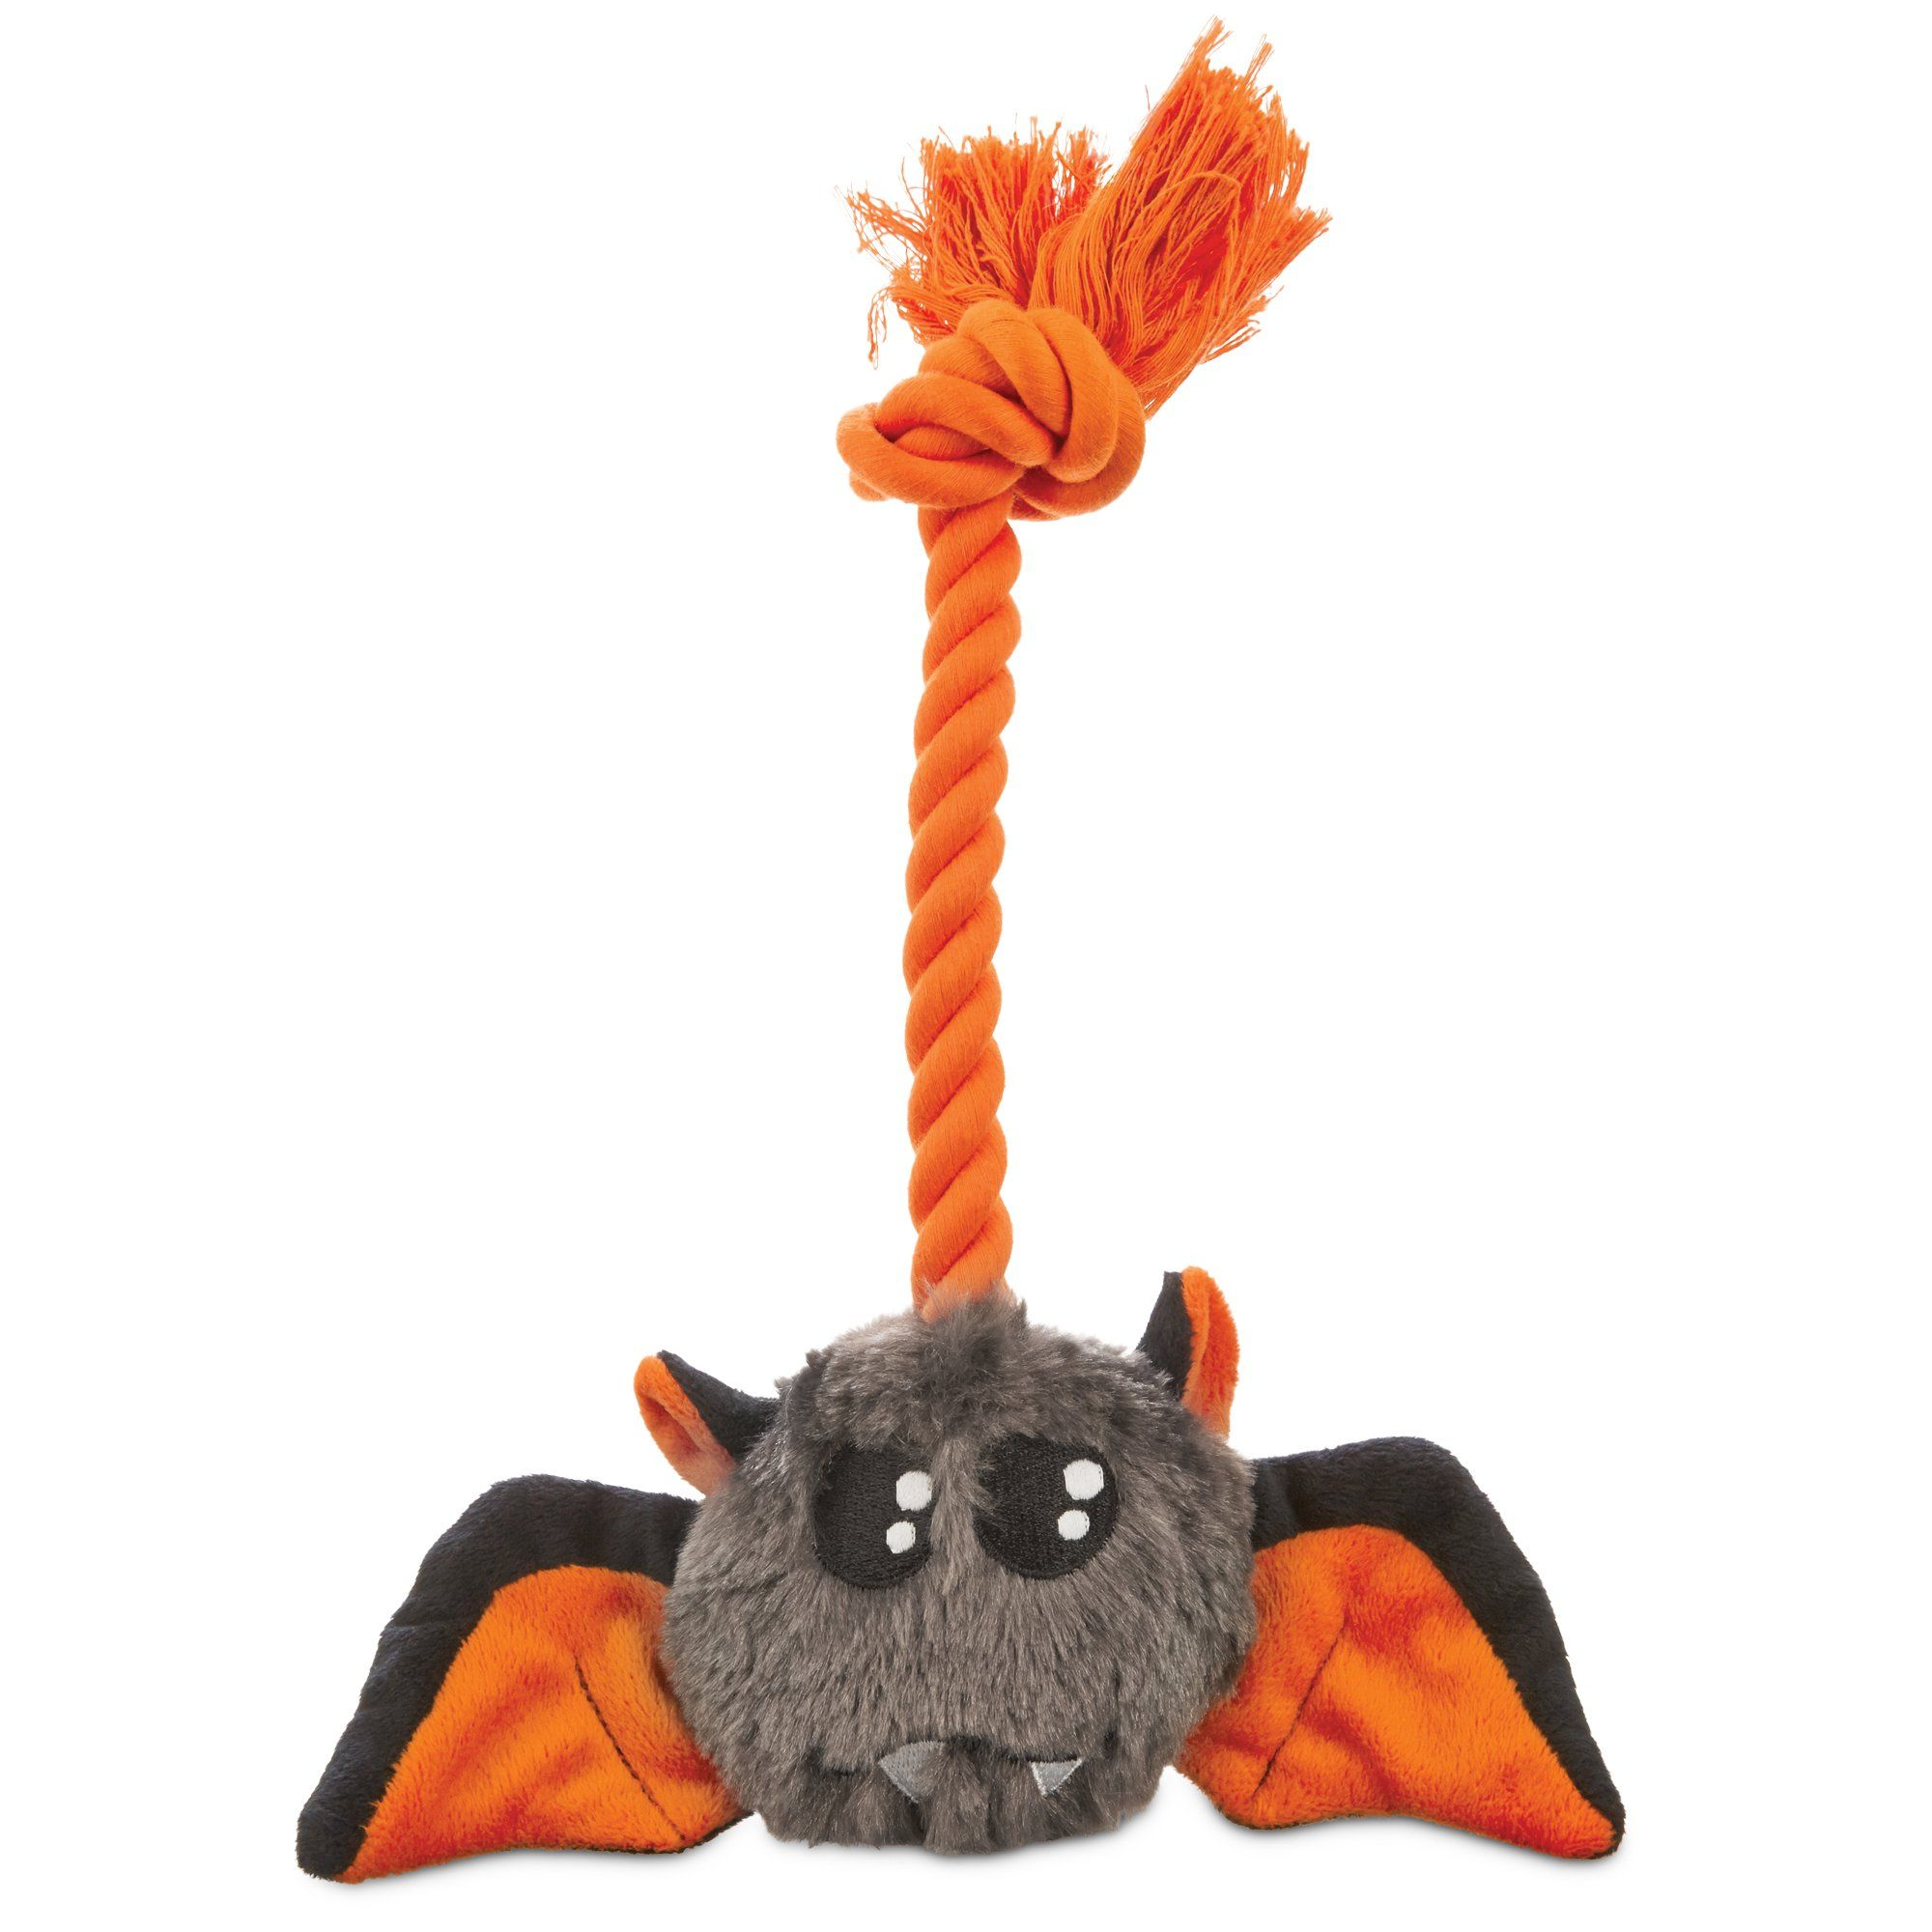 Pin by liu qiong on Pet Stuff Rope dog toys, Dog toys